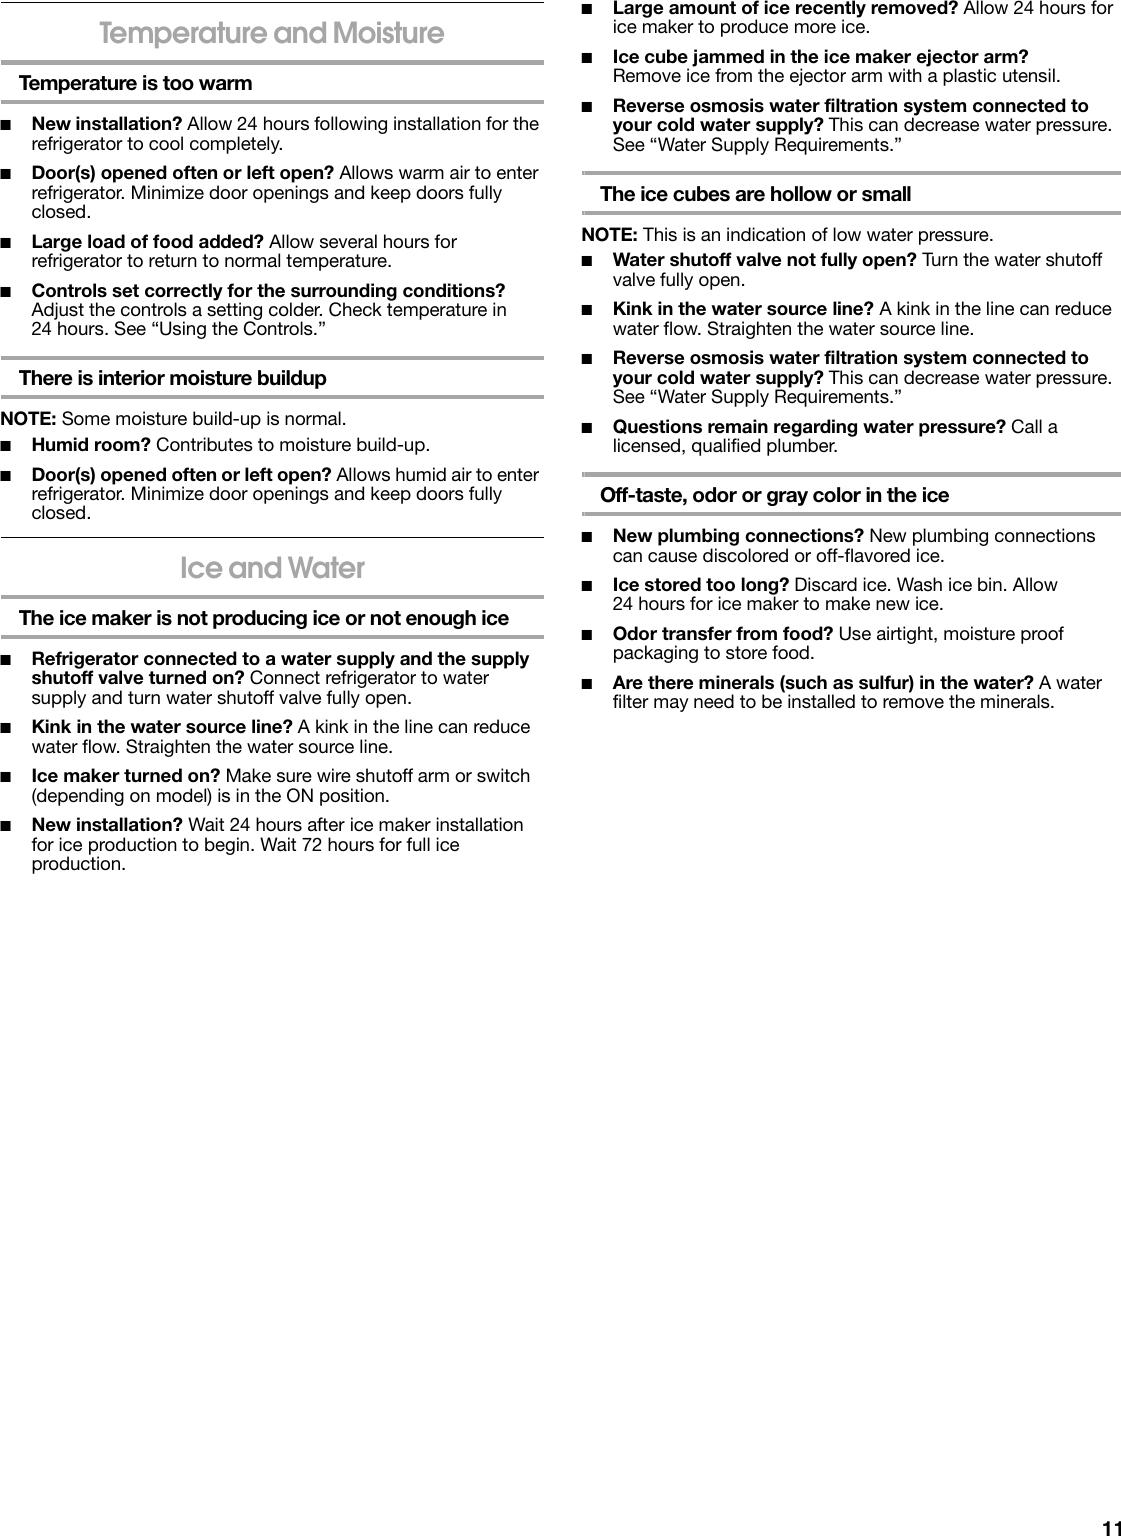 hight resolution of page 11 of 12 whirlpool whirlpool tt21akxkq02 users manual whirlpool